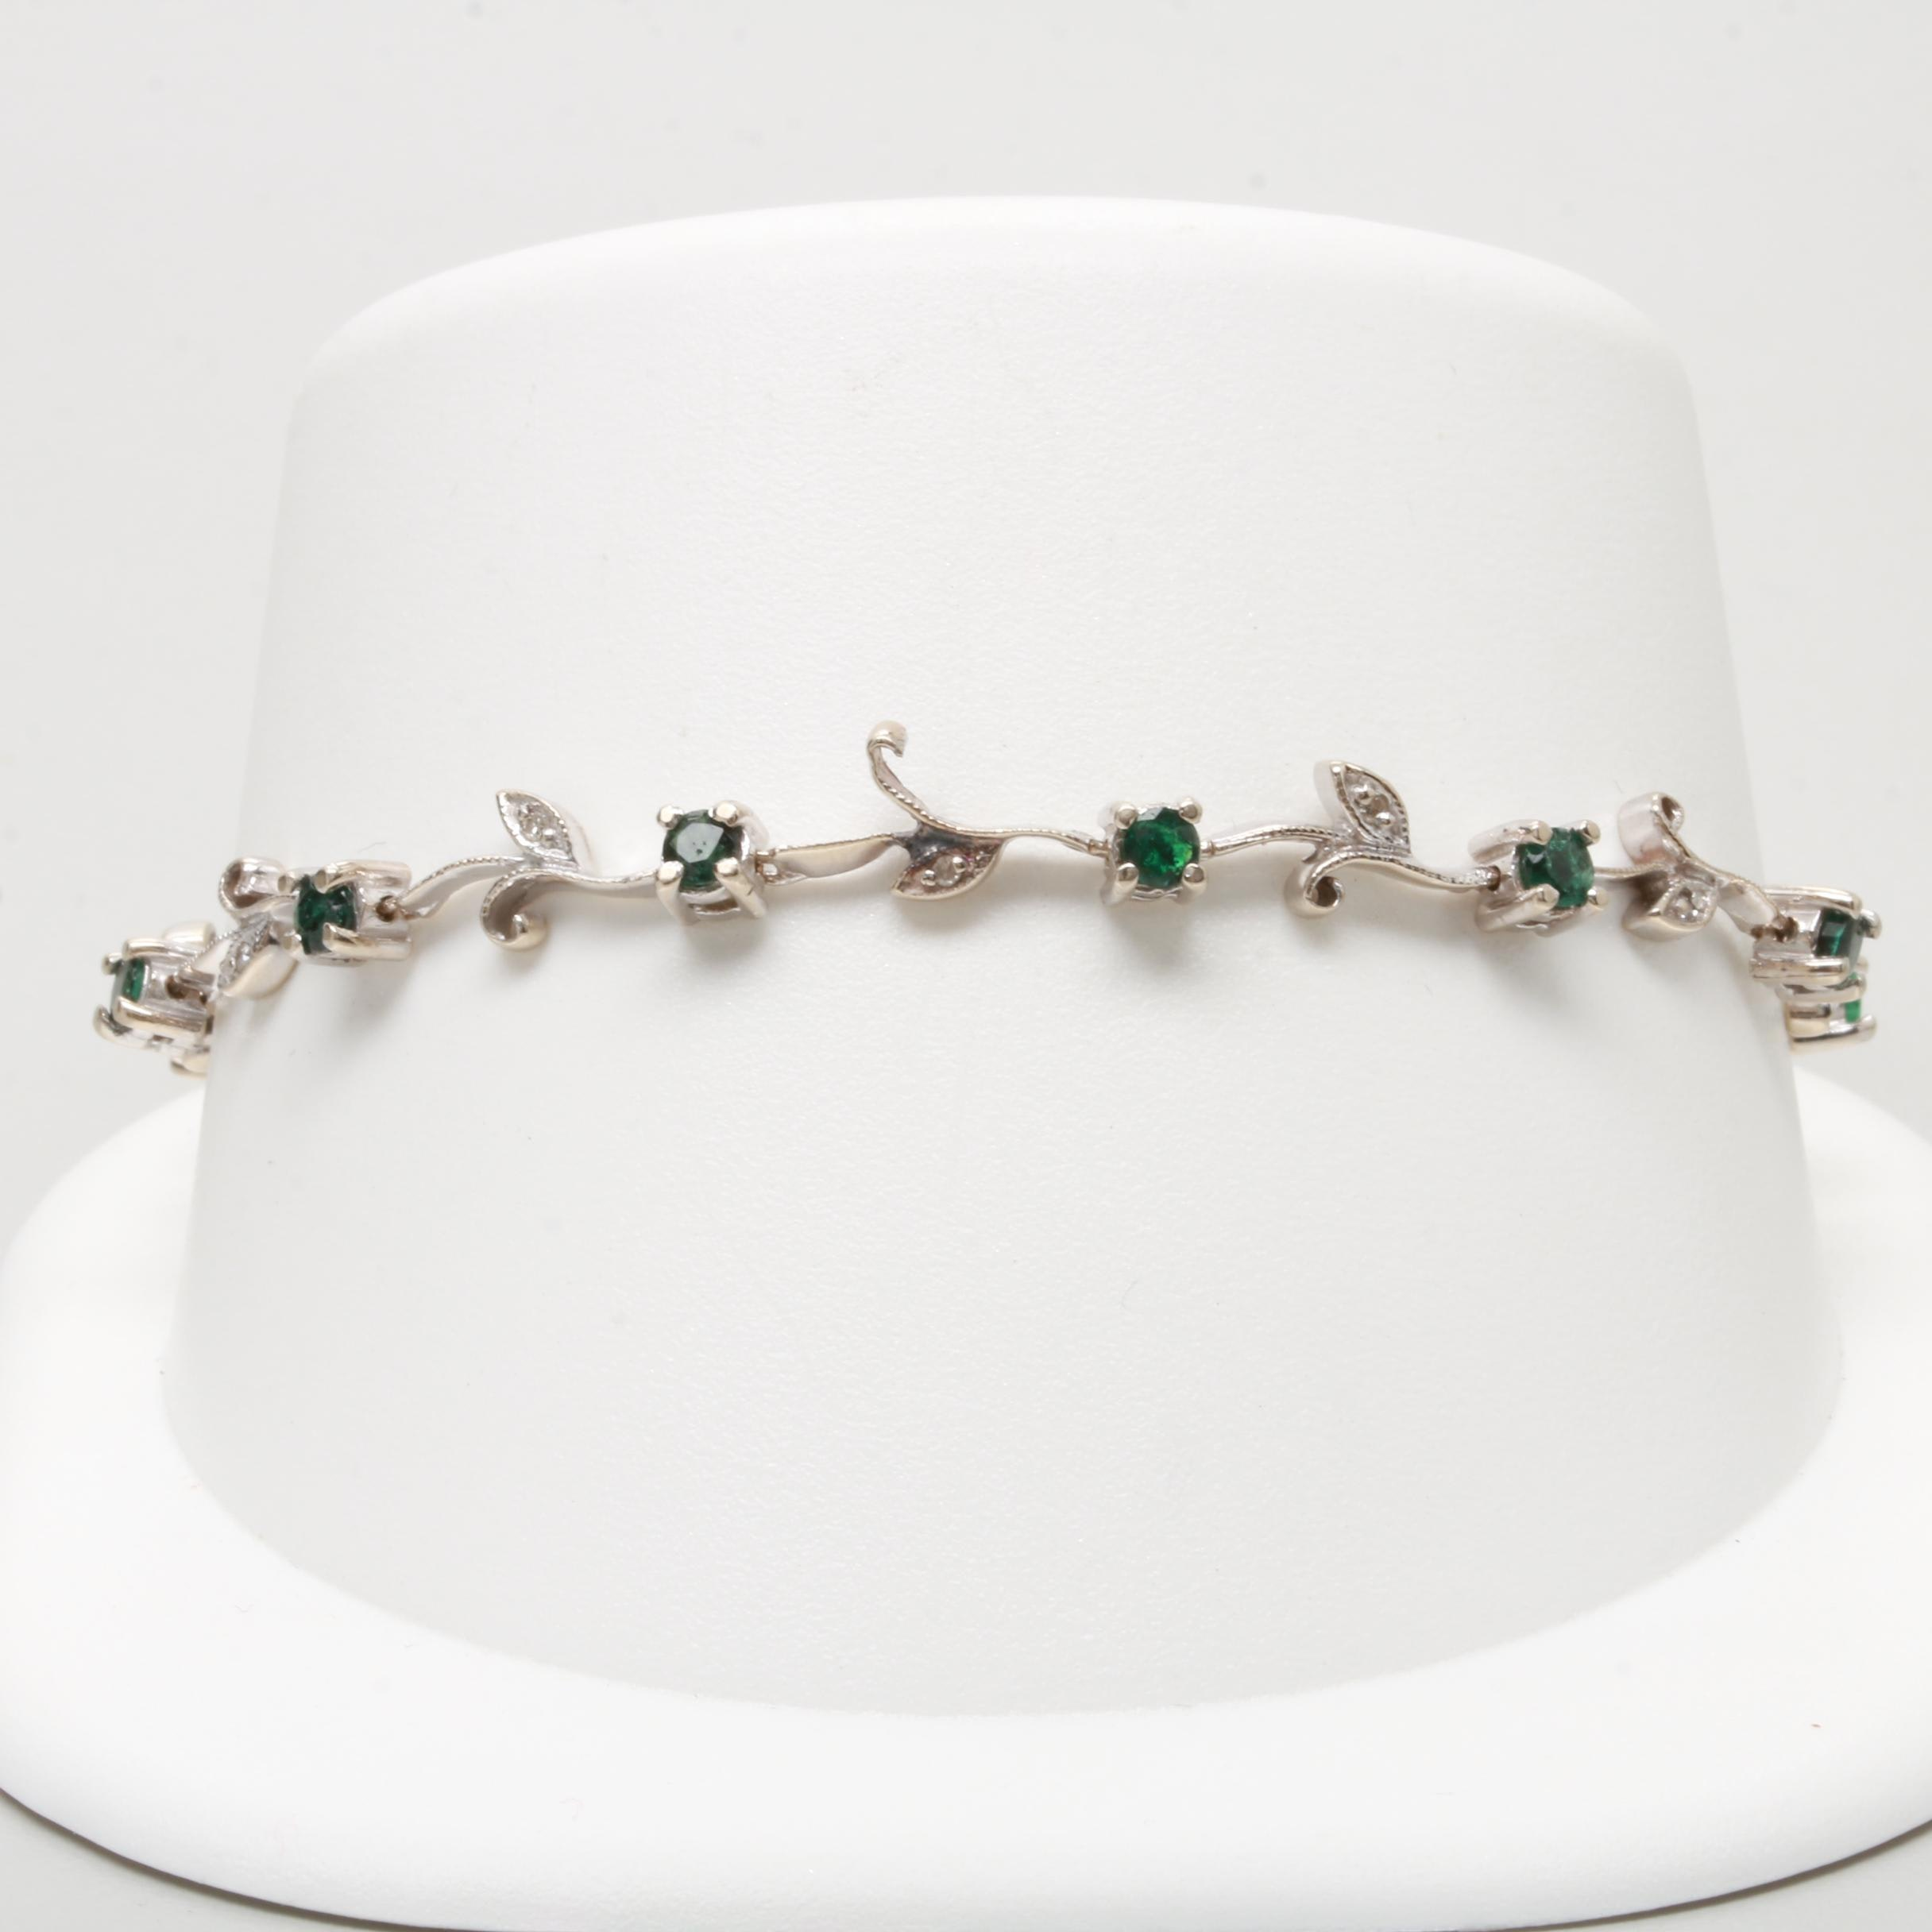 14K White Gold Diamond and Emerald Floral Link Bracelet